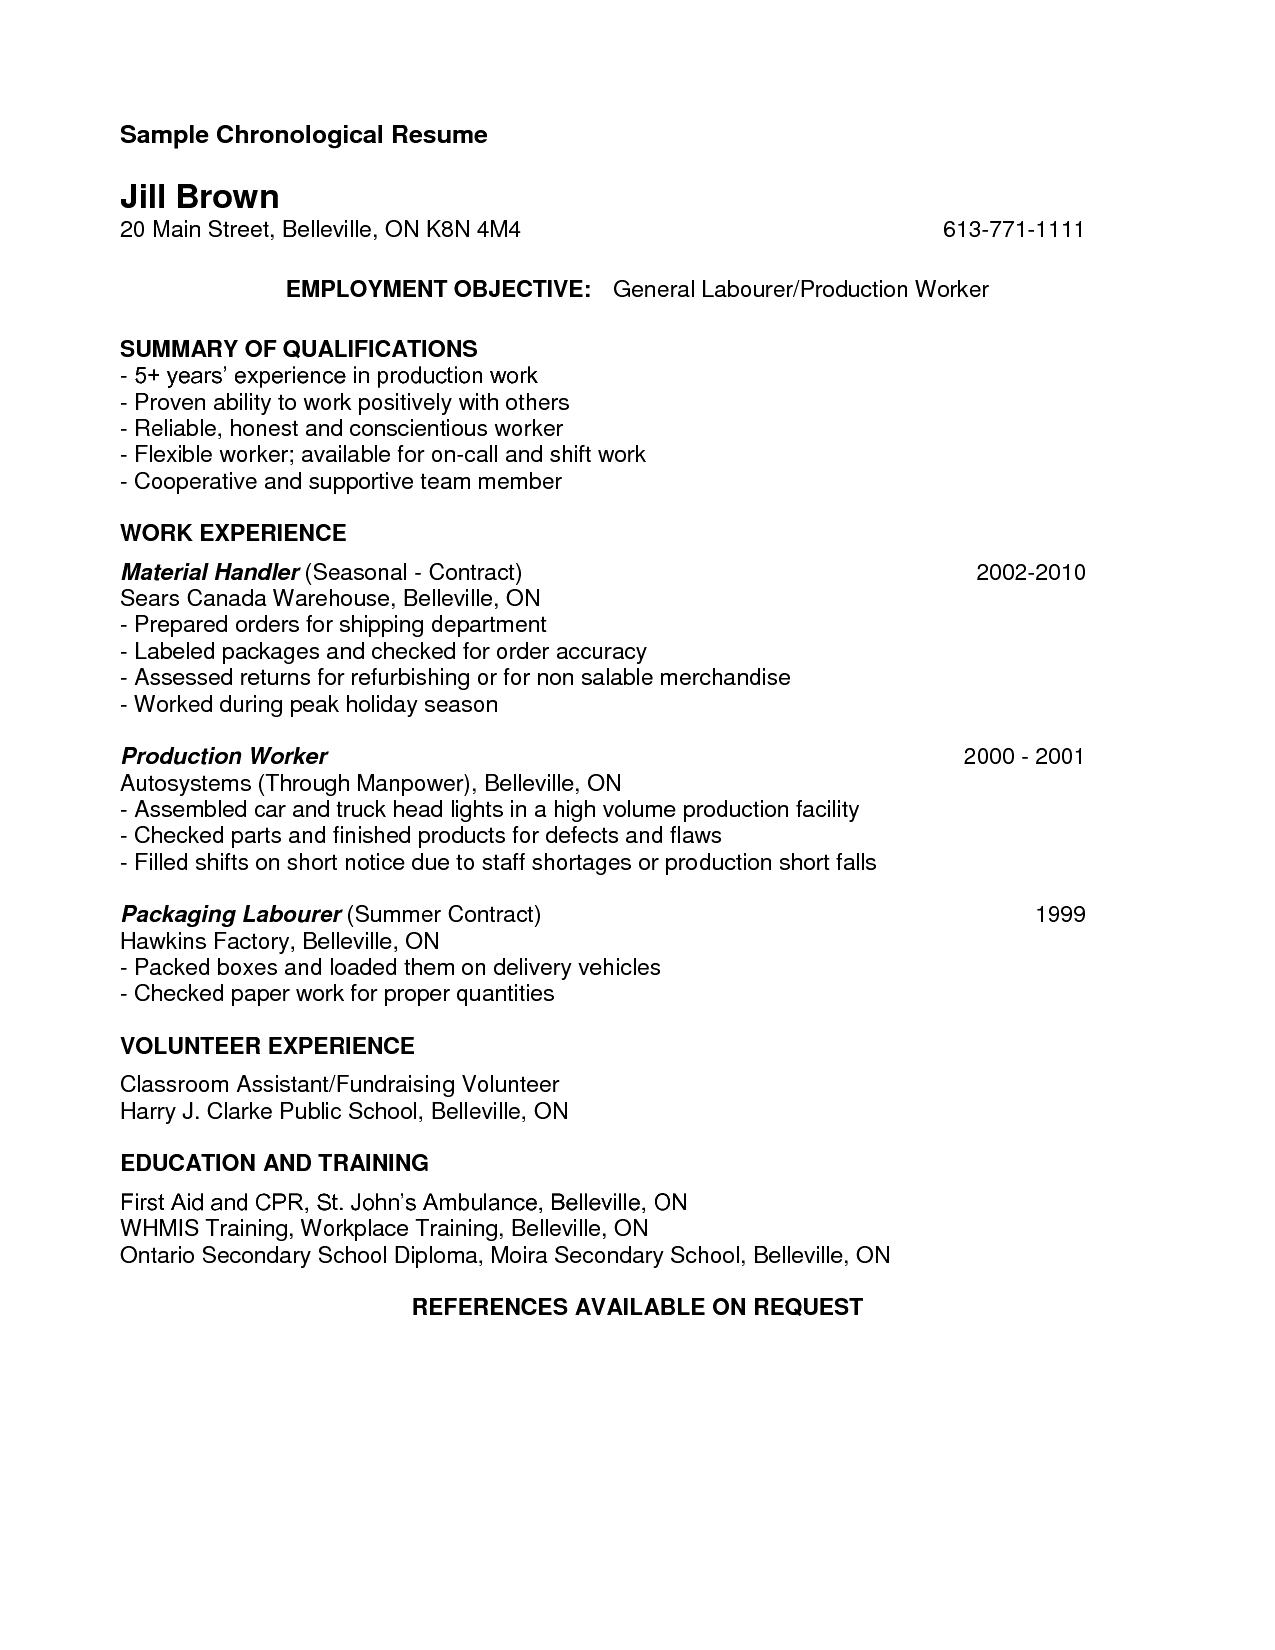 Cover Letter Resume For Manufacturing Job Bizdoska Factory Worker Exemple Work Experience Gunlocke